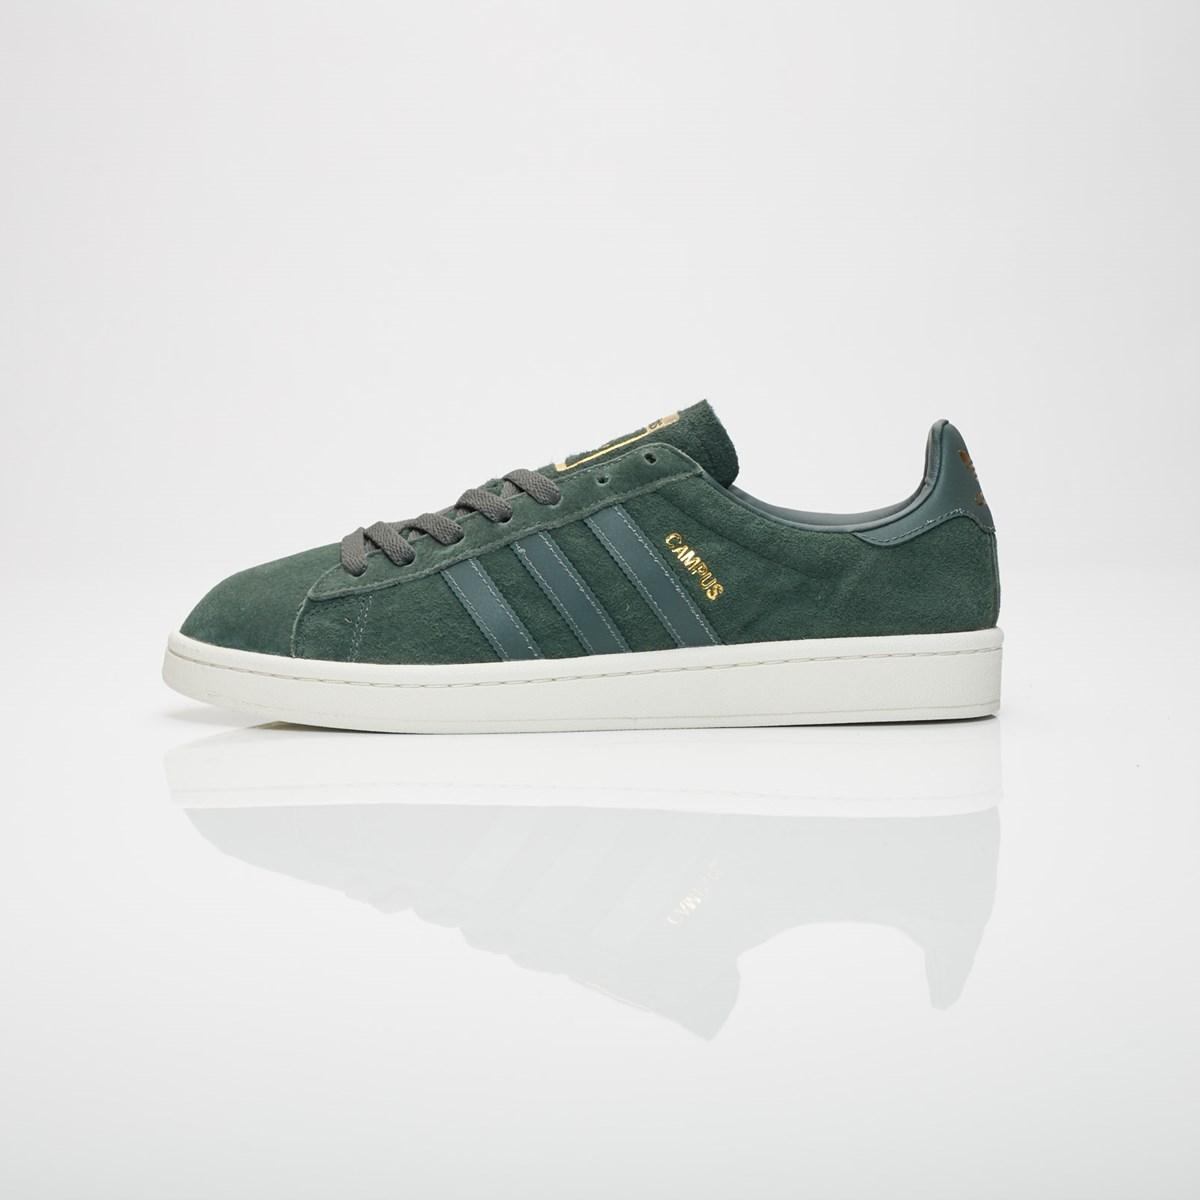 watch ef0e4 d8743 adidas Campus - Bz0074 - Sneakersnstuff  Sneaker  Streetwear online seit  1999